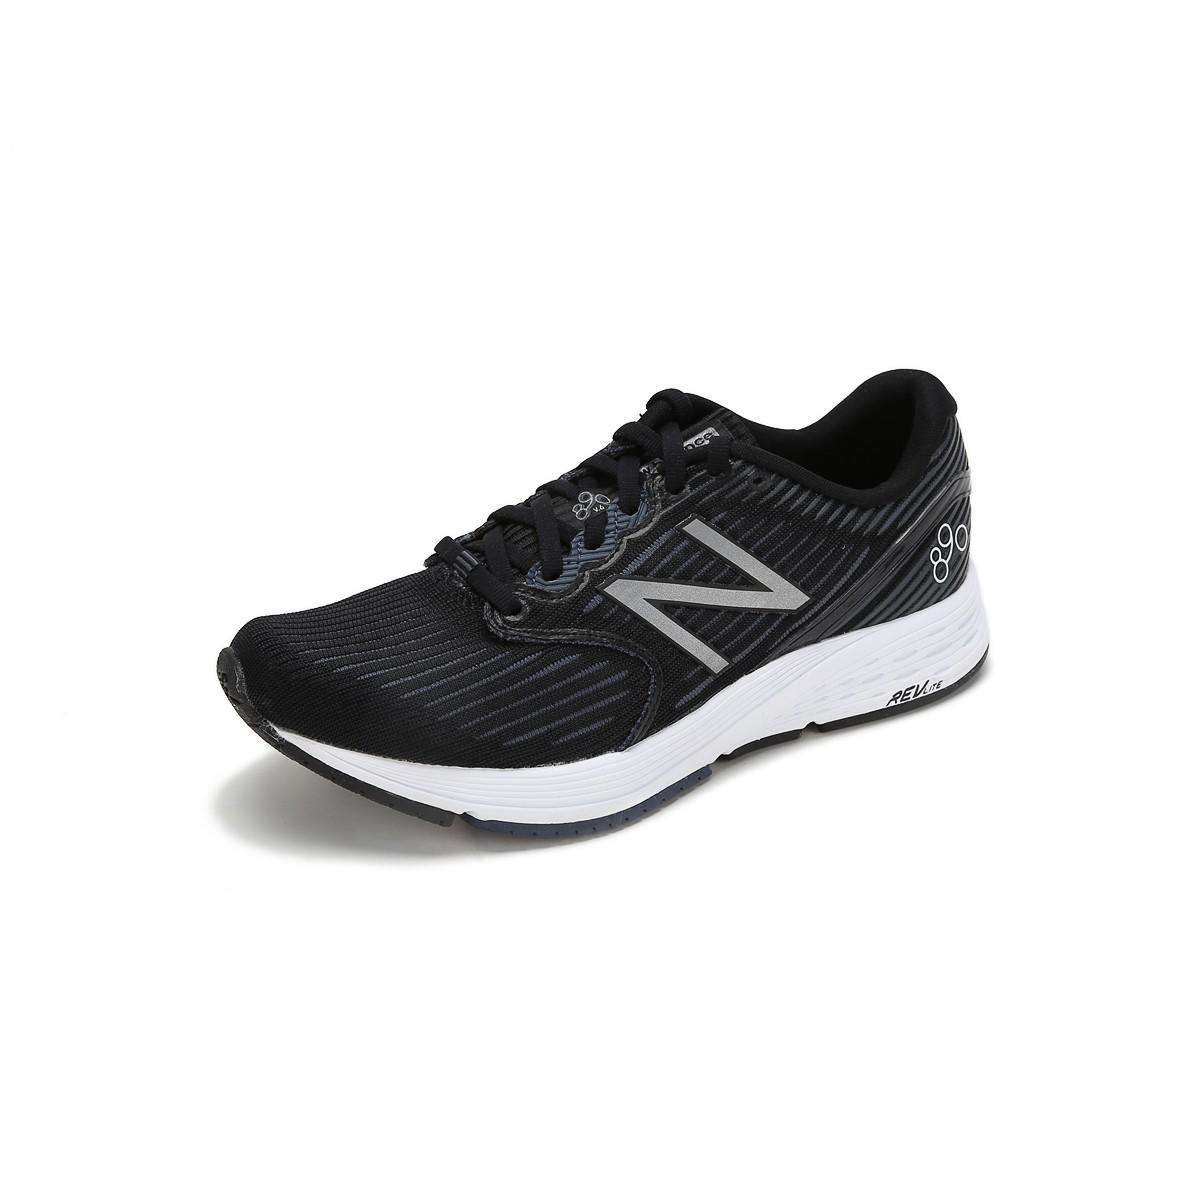 new balance NB890 女士跑鞋 W890BK6 黑色 35